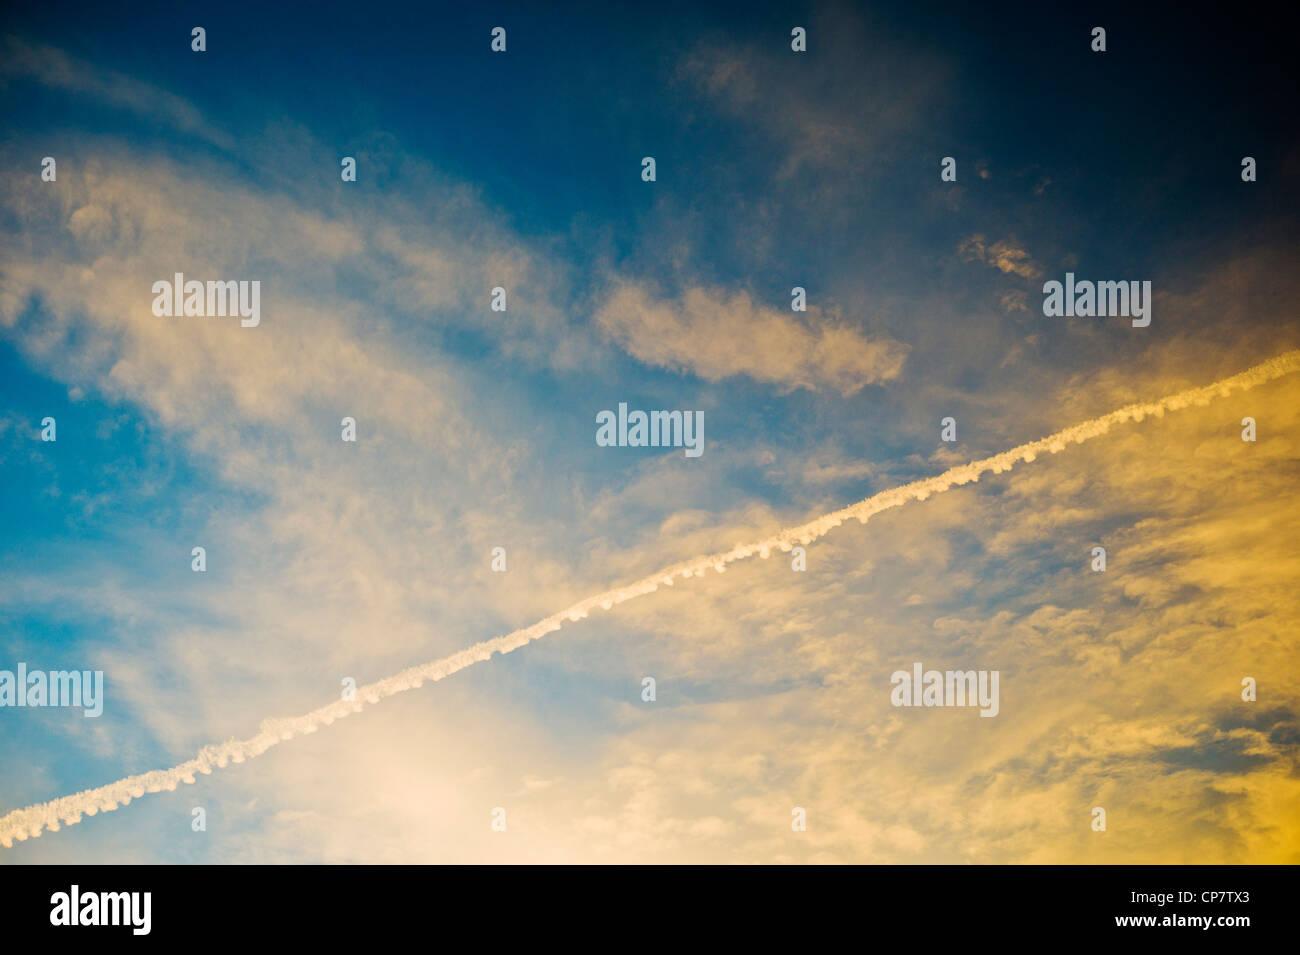 Las estelas de condensación de chorro de aerolíneas comerciales a través de un claro atardecer Atardecer cielo azul Foto de stock